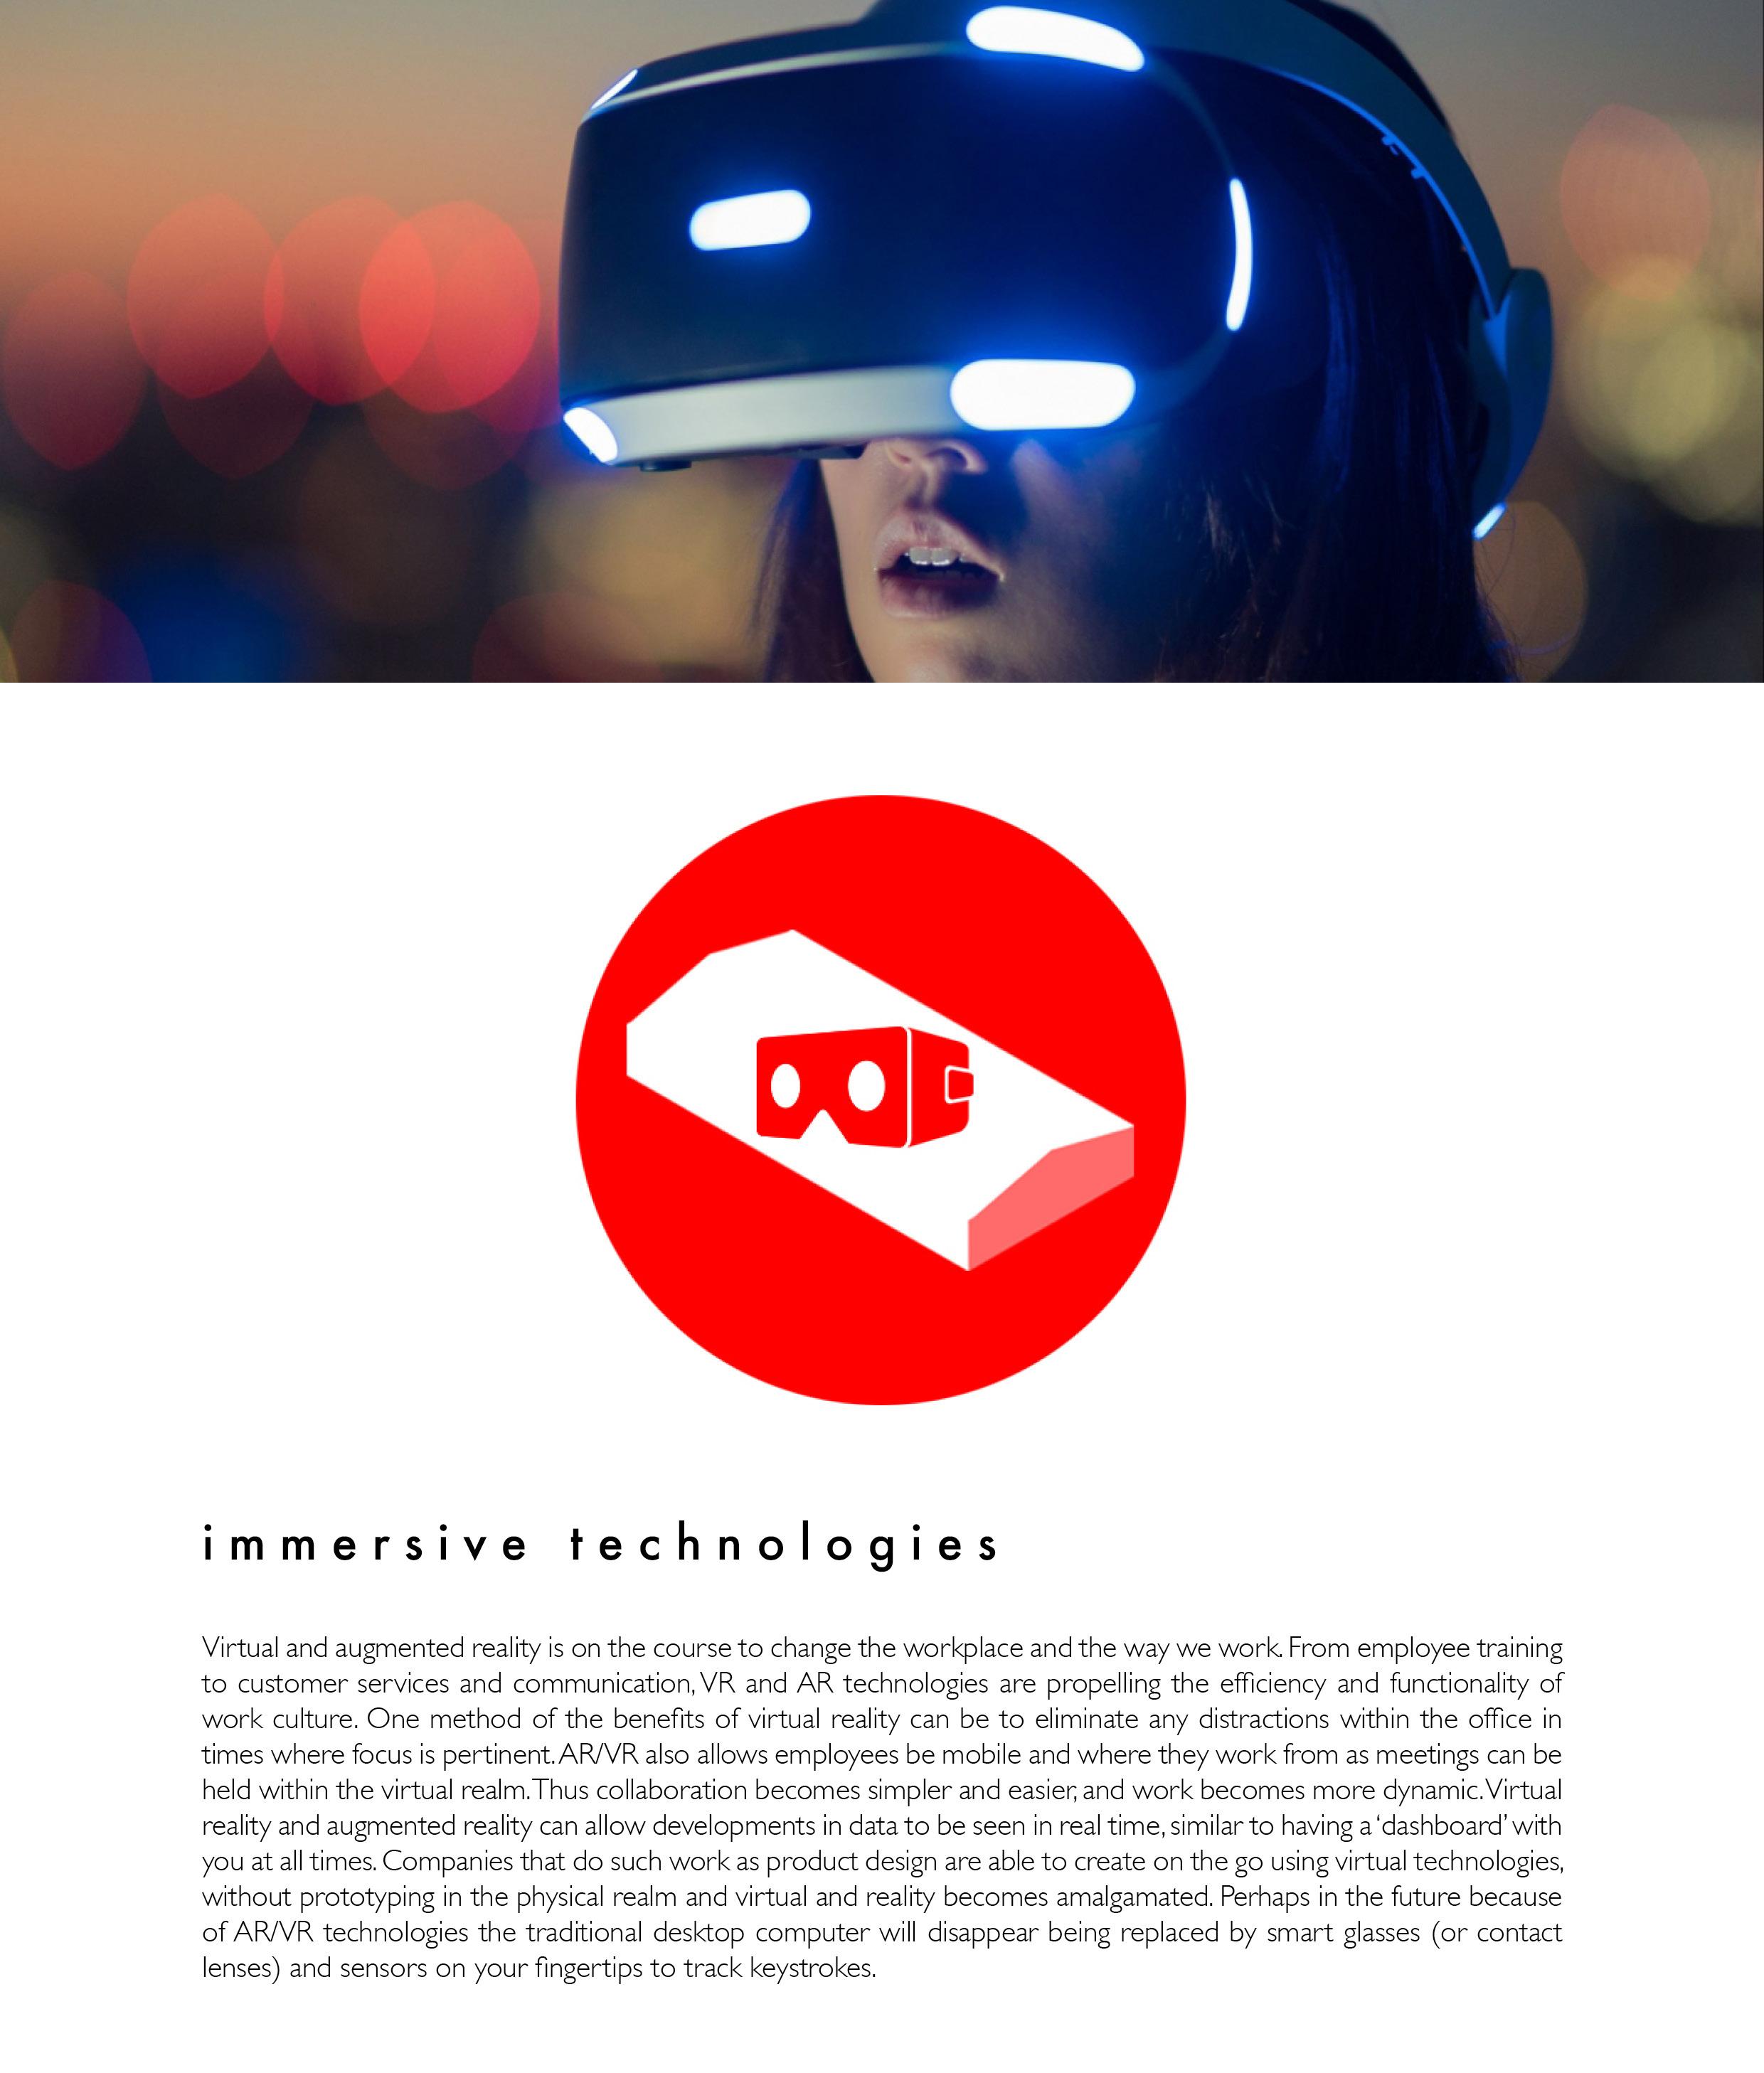 Atelier Aitken Workplace design 3 immersive technologies.jpg